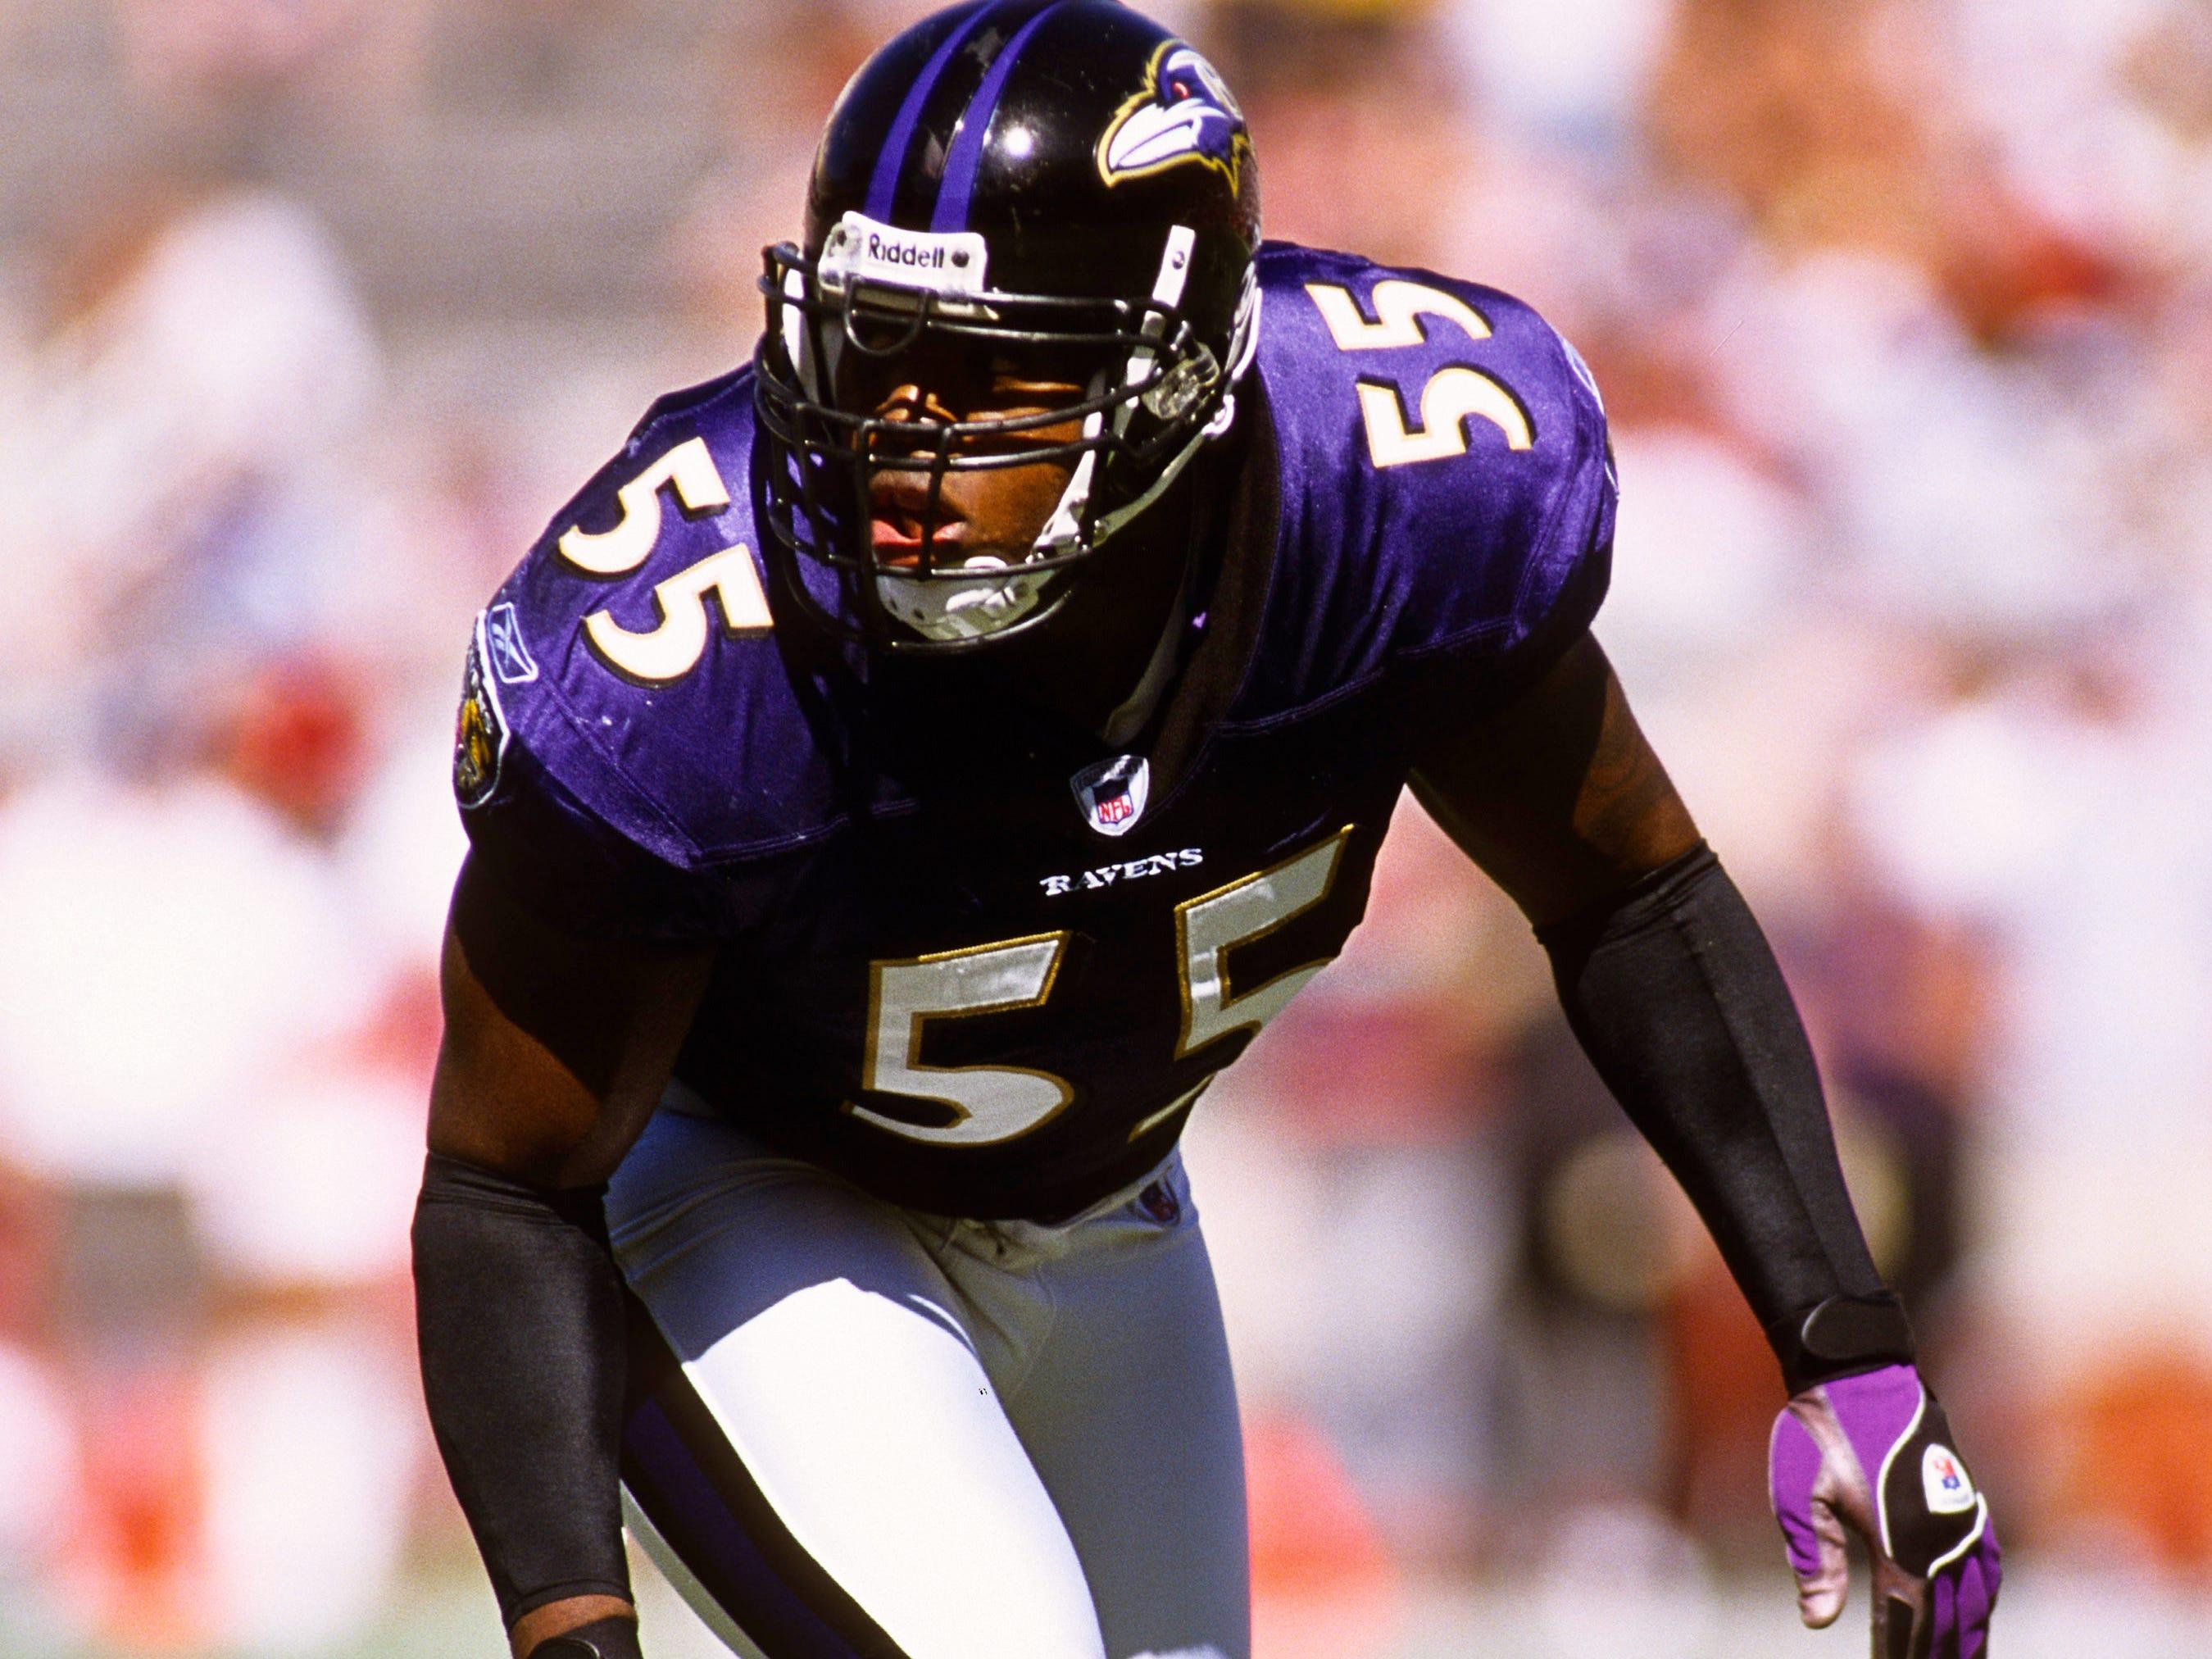 Baltimore Ravens linebacker Terrell Suggs (55) in action against the Arizona Cardinals at Sun Devil Stadium.